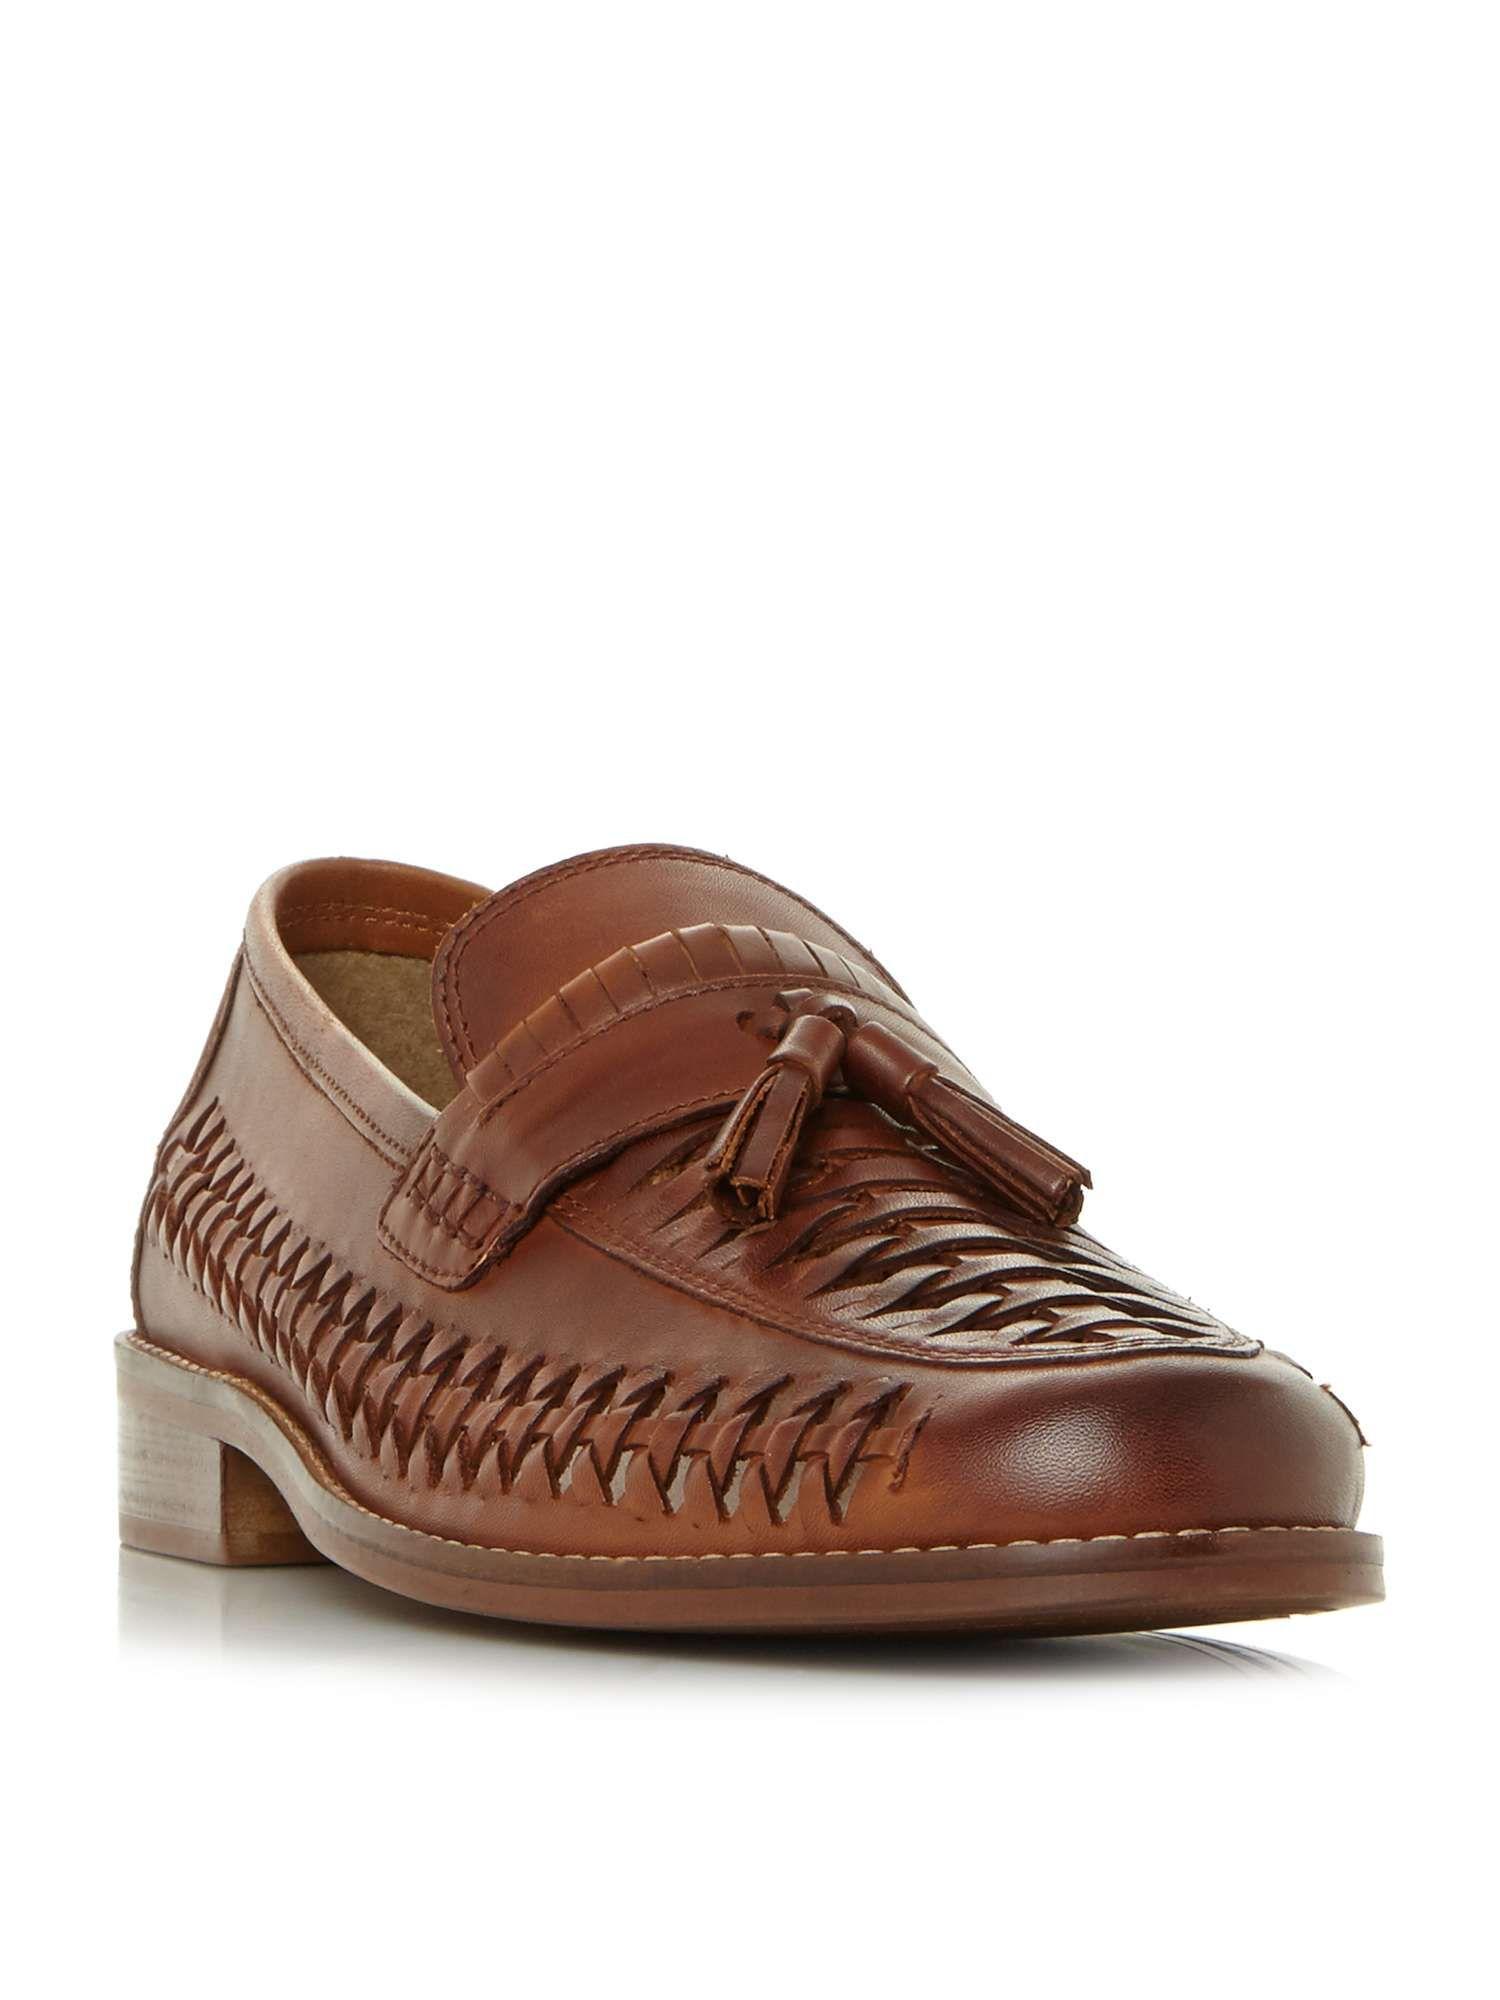 Dune Broadhaven Woven Tassle Loafer Shoes House Of Fraser Men S